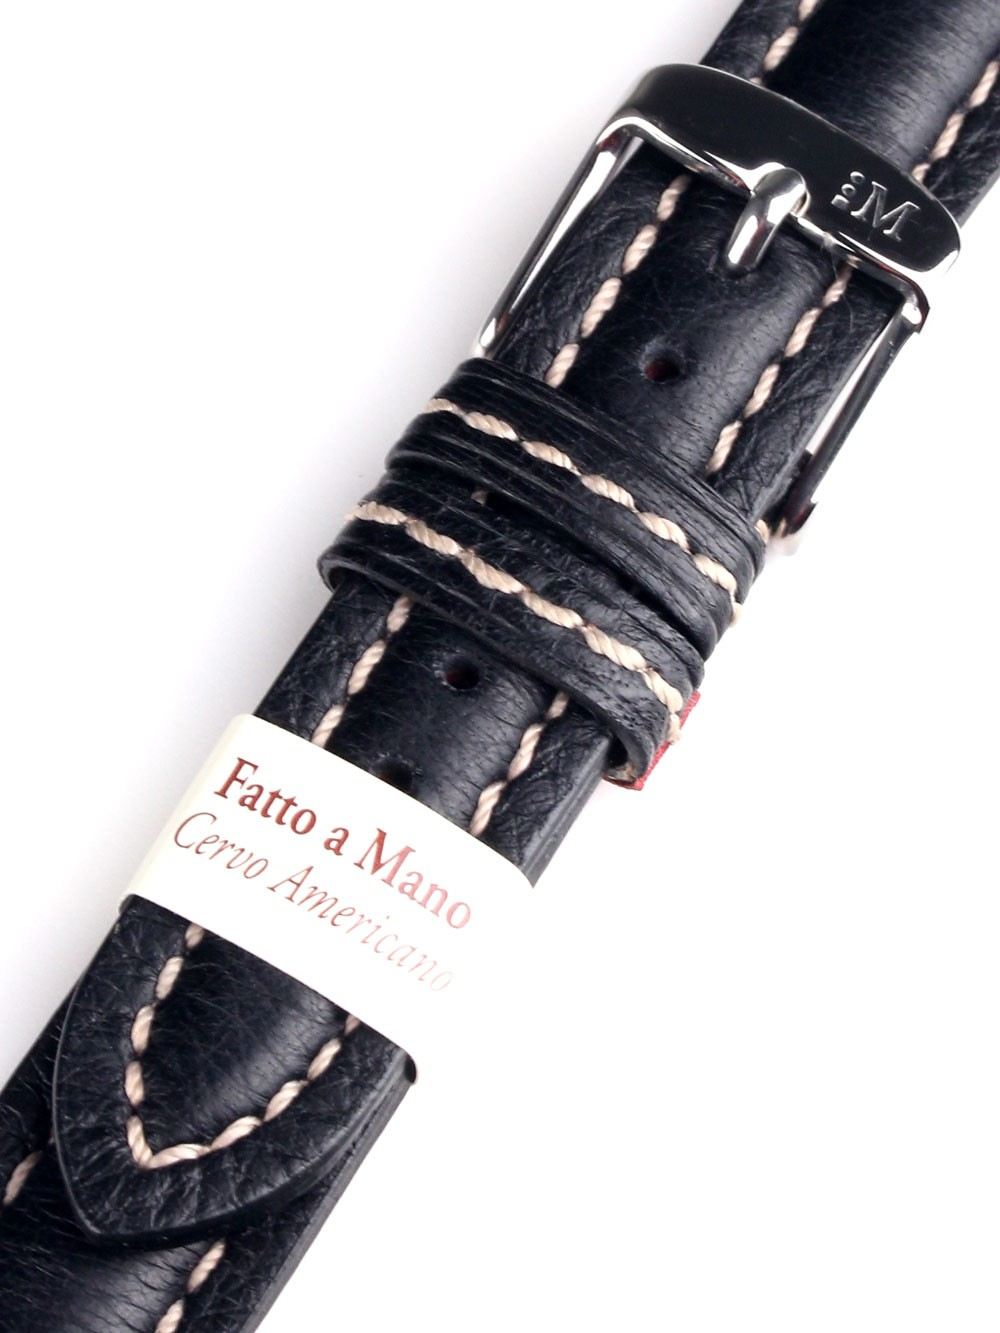 Curea de ceas Morellato A01U3885A62019CR18 schwarzes Uhren18mm